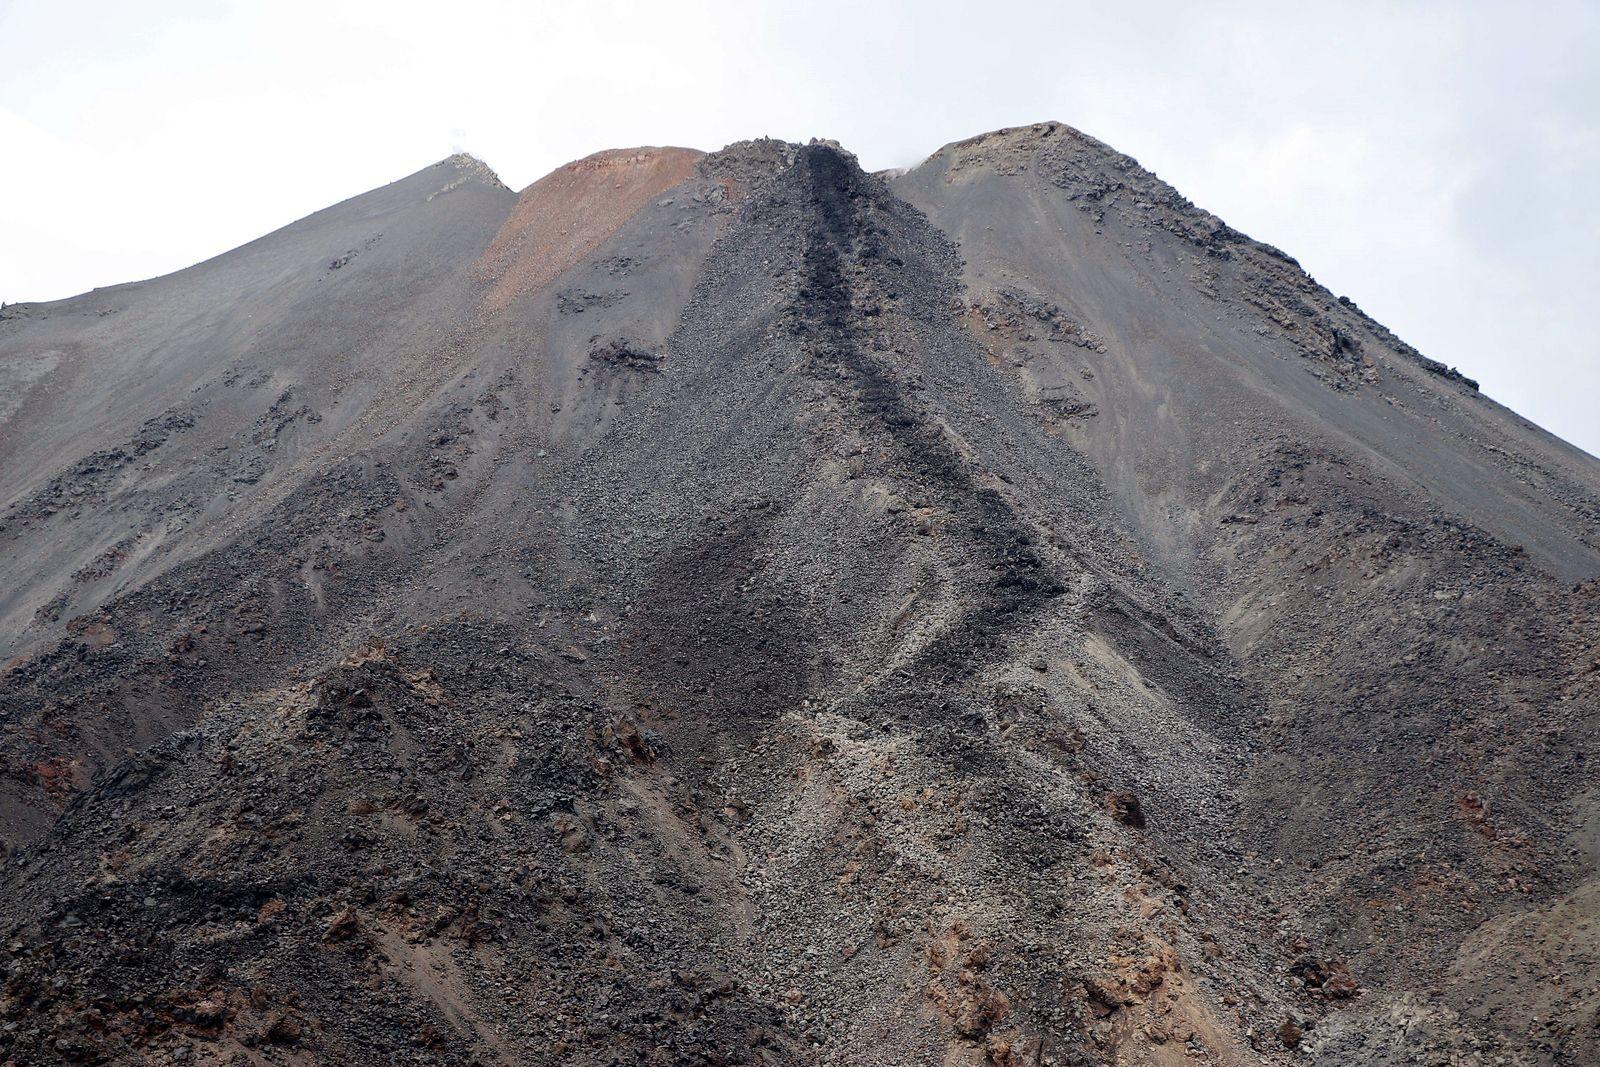 Nevados de Chillan - field analyzes of the L5 flow - Doc. Sernageomin 26.03.2021